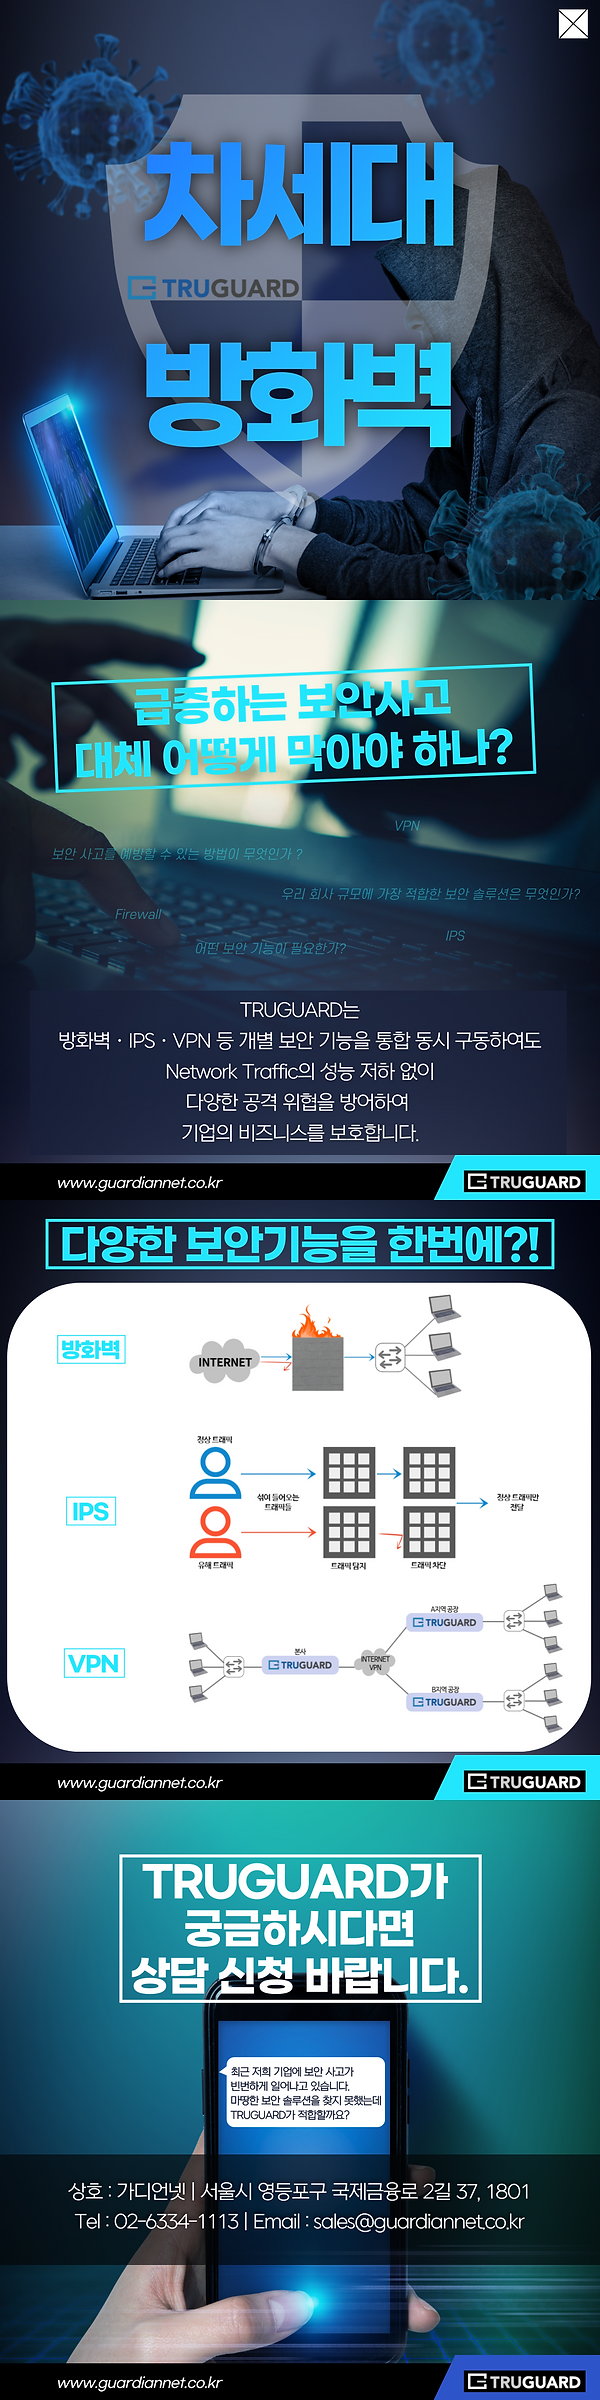 TRUGUARD_홍보물_X표시.png